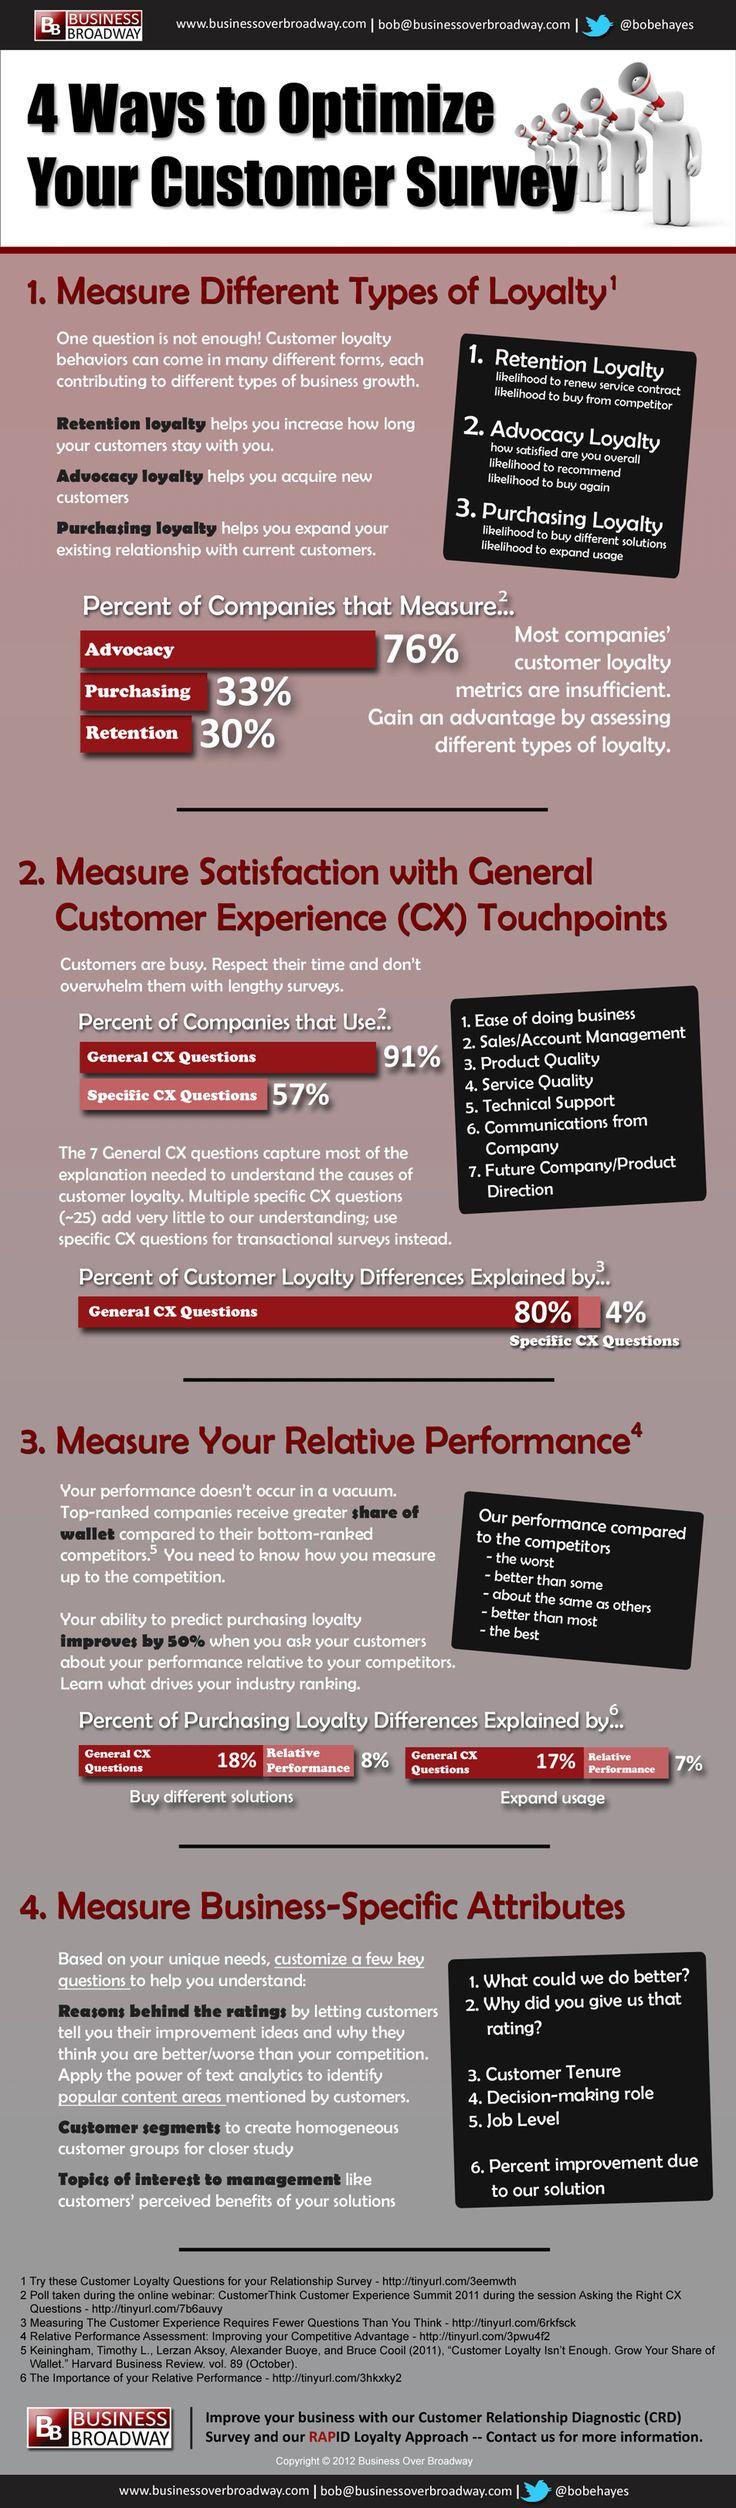 4-Ways-to-Optimize-Your-Customer-Survey